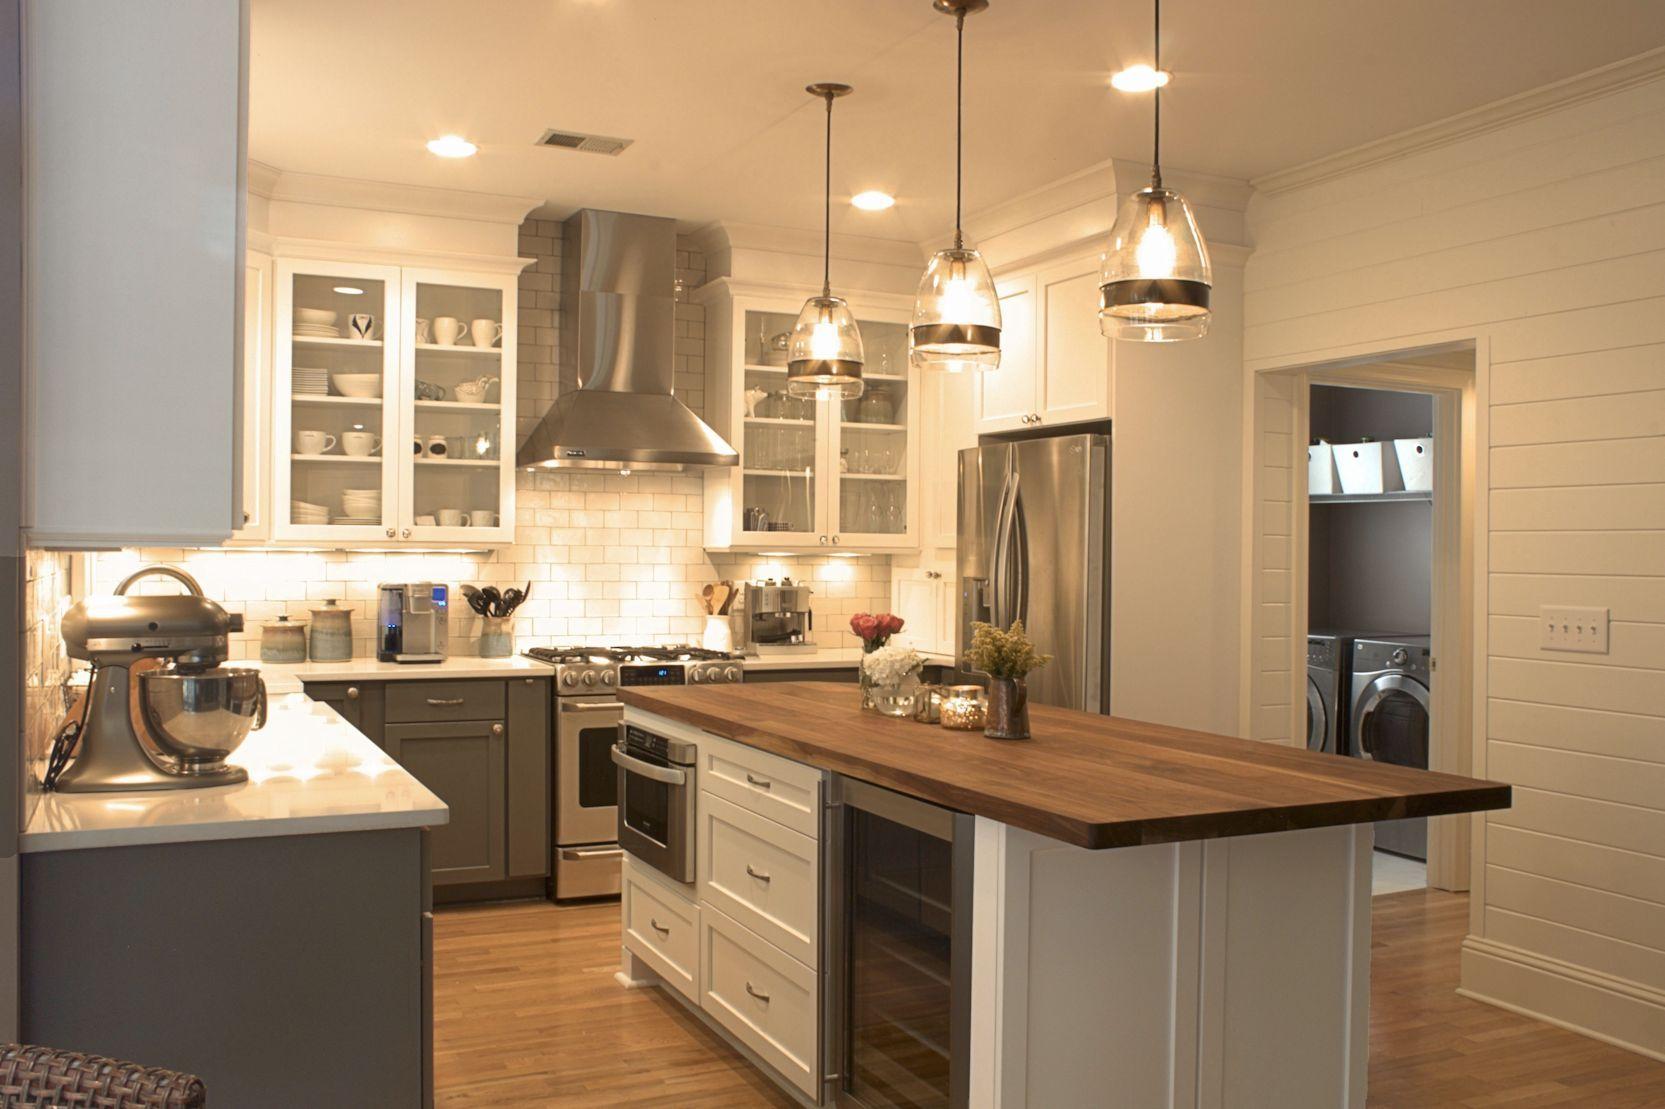 Atlanta Kitchen Remodeling Kitchen Design And Organization Home Remodeling Atlanta Kitchen Remodel Kitchen Design Brooklyn Kitchen